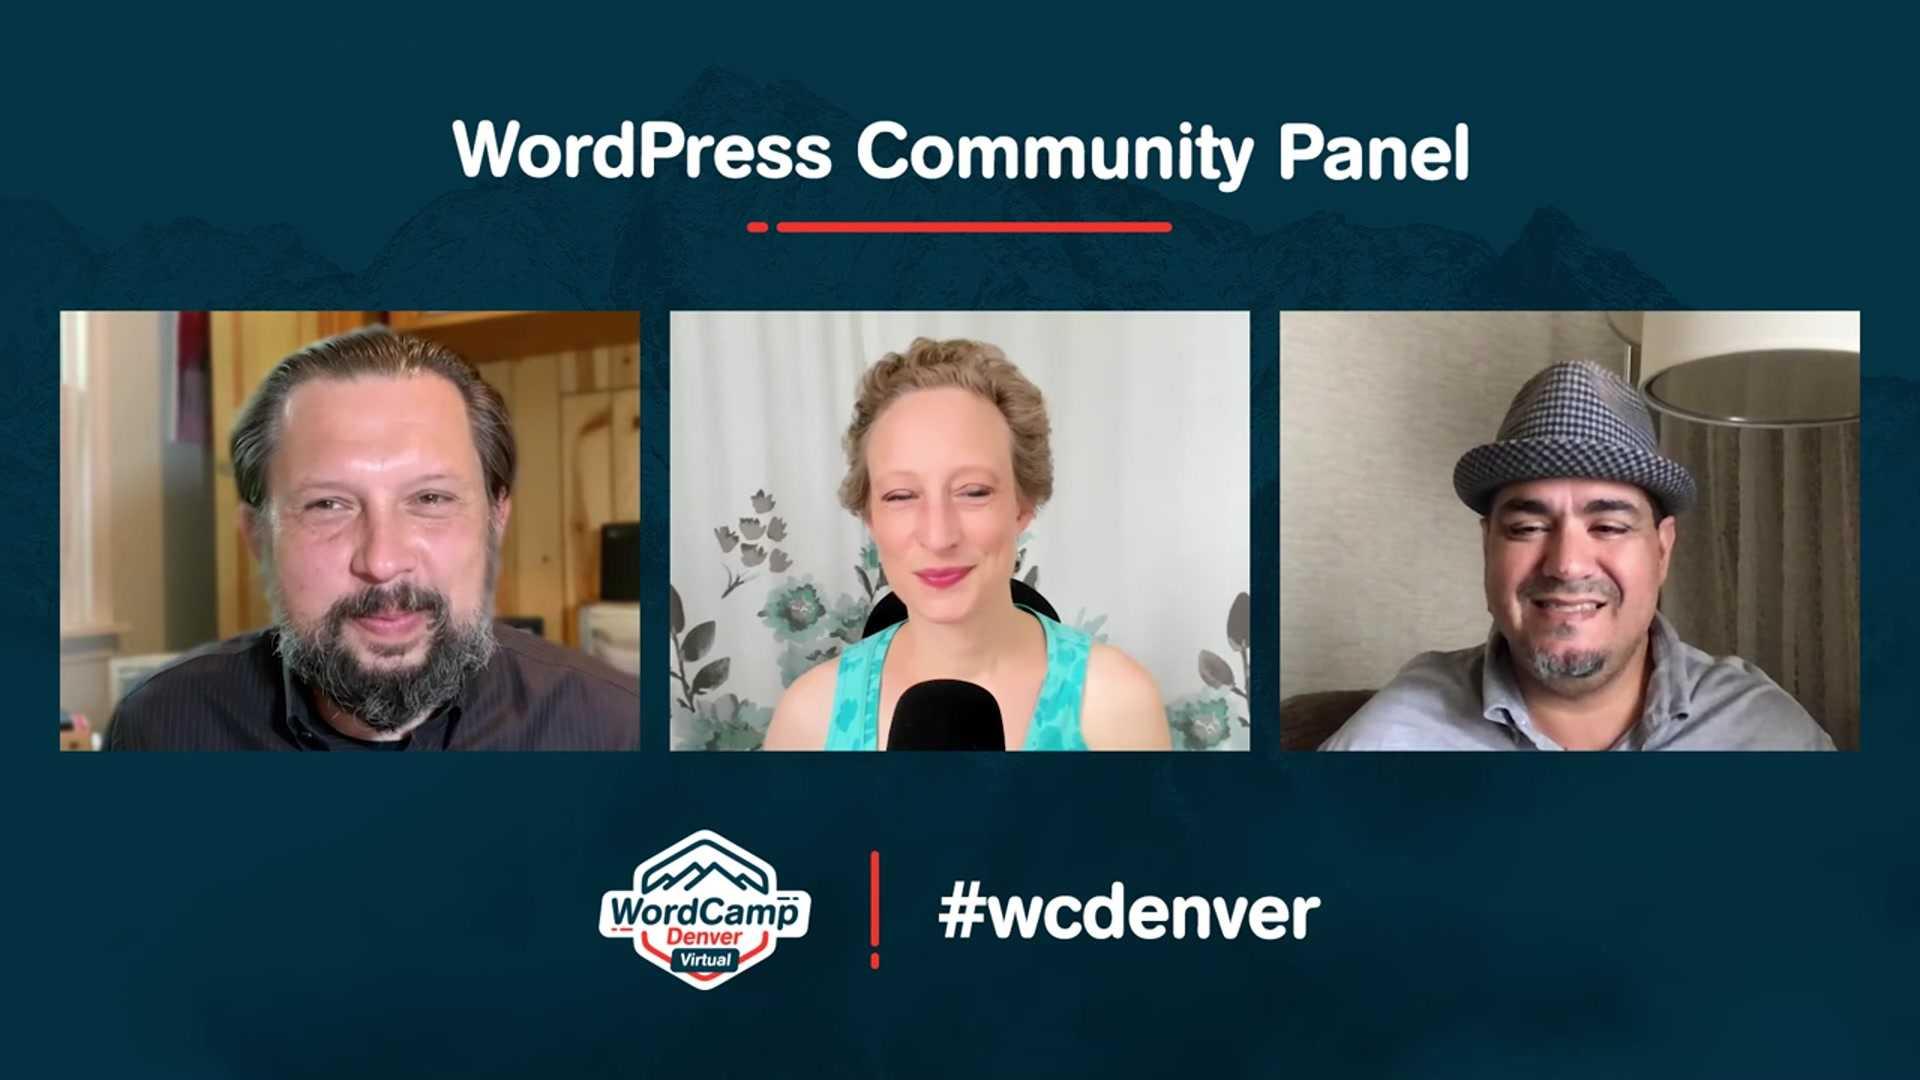 Chris Lema, Jocelyn Mozak, Robert Jacobi: Marketing Automation Panel Discussion